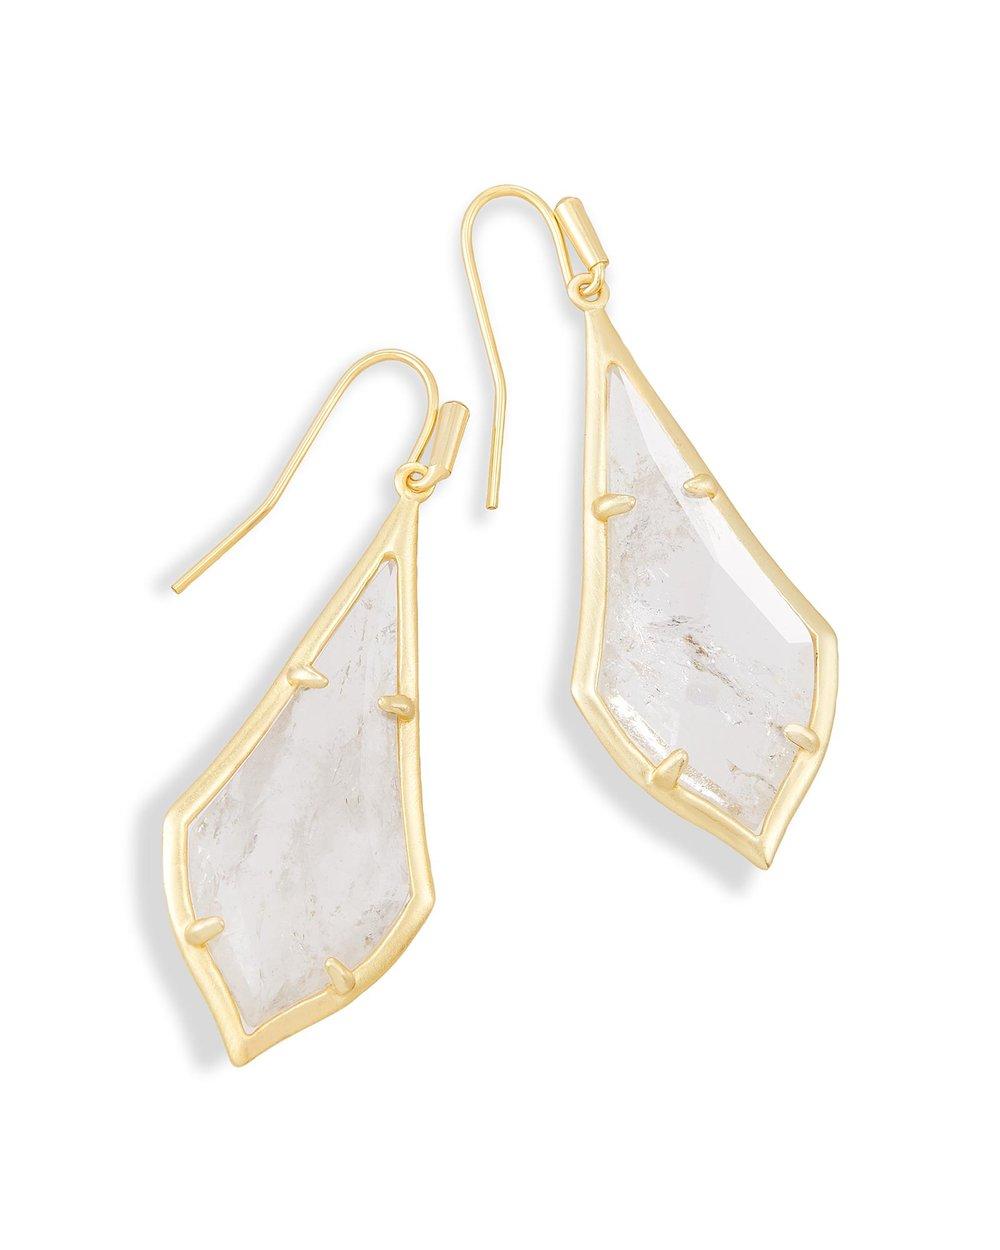 Olivia Gold Drop Earrings- $39.97